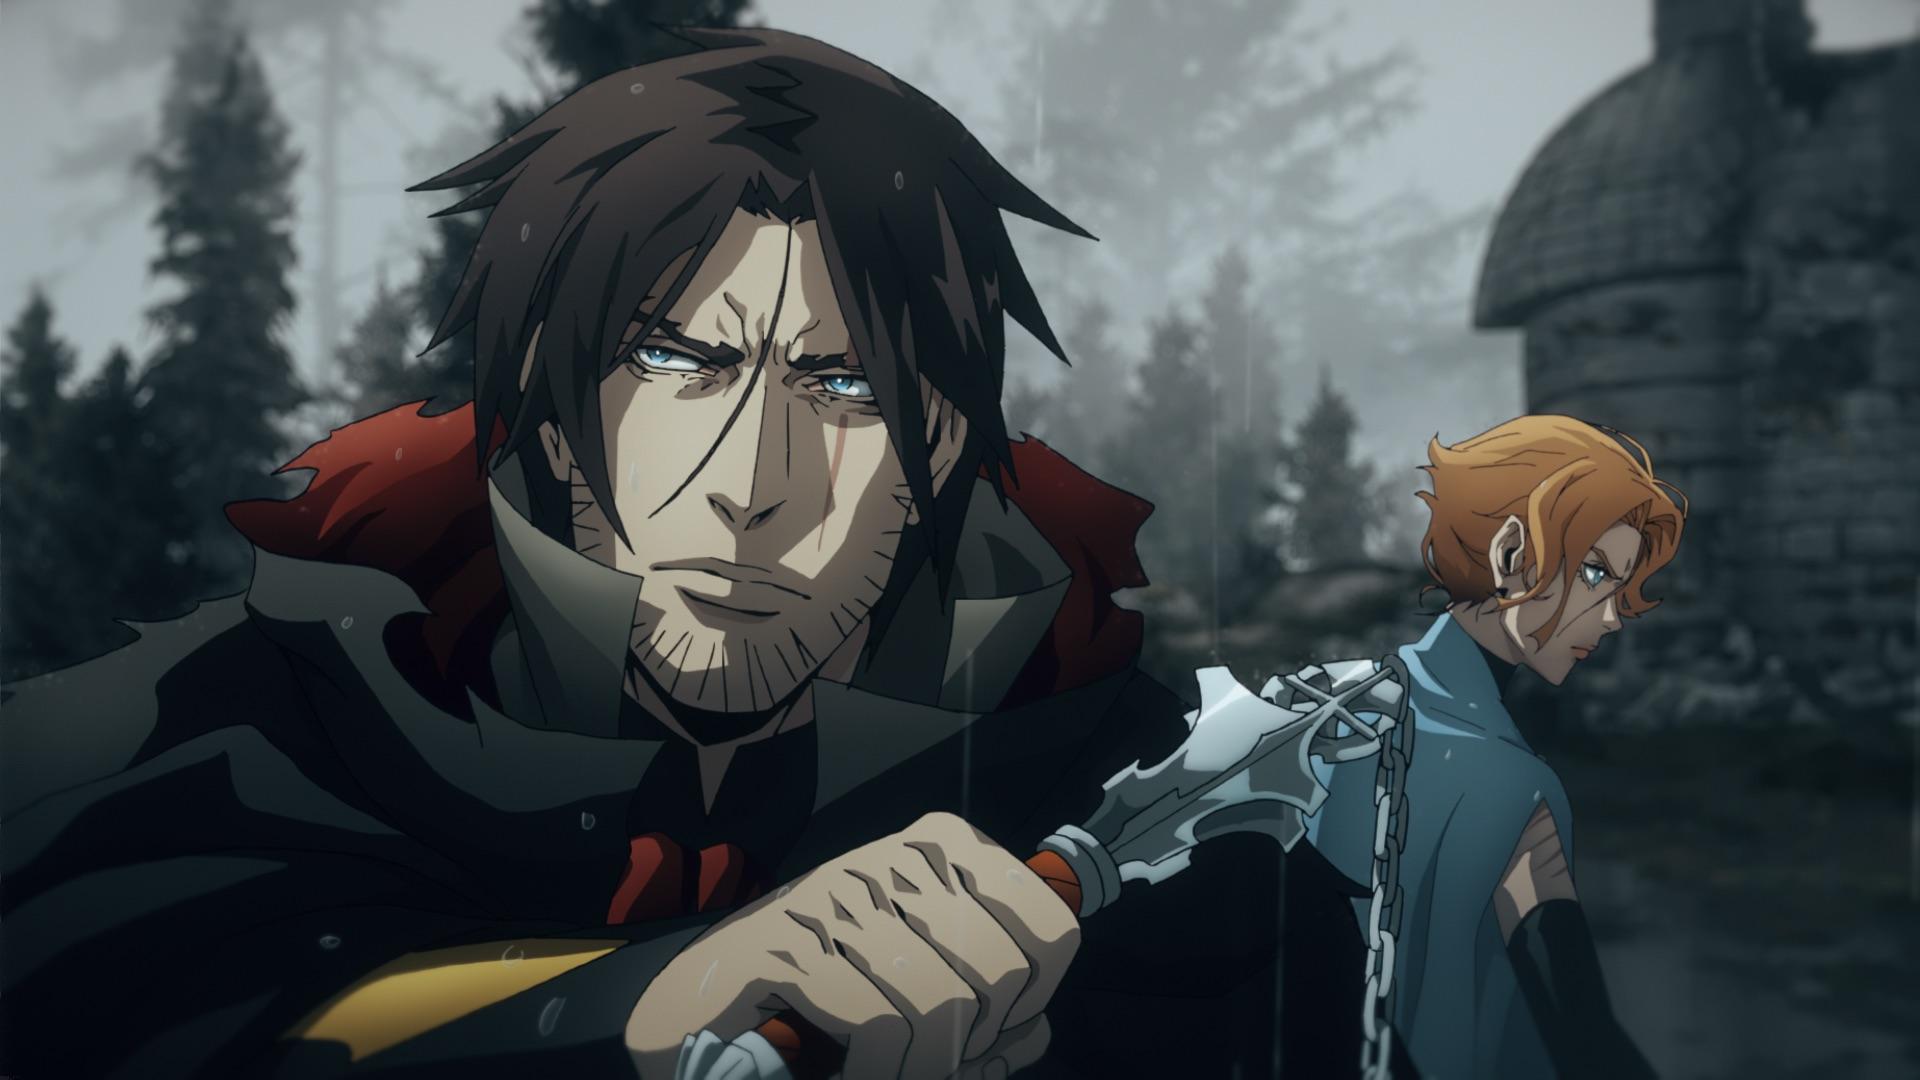 Castlevania - sezon 4